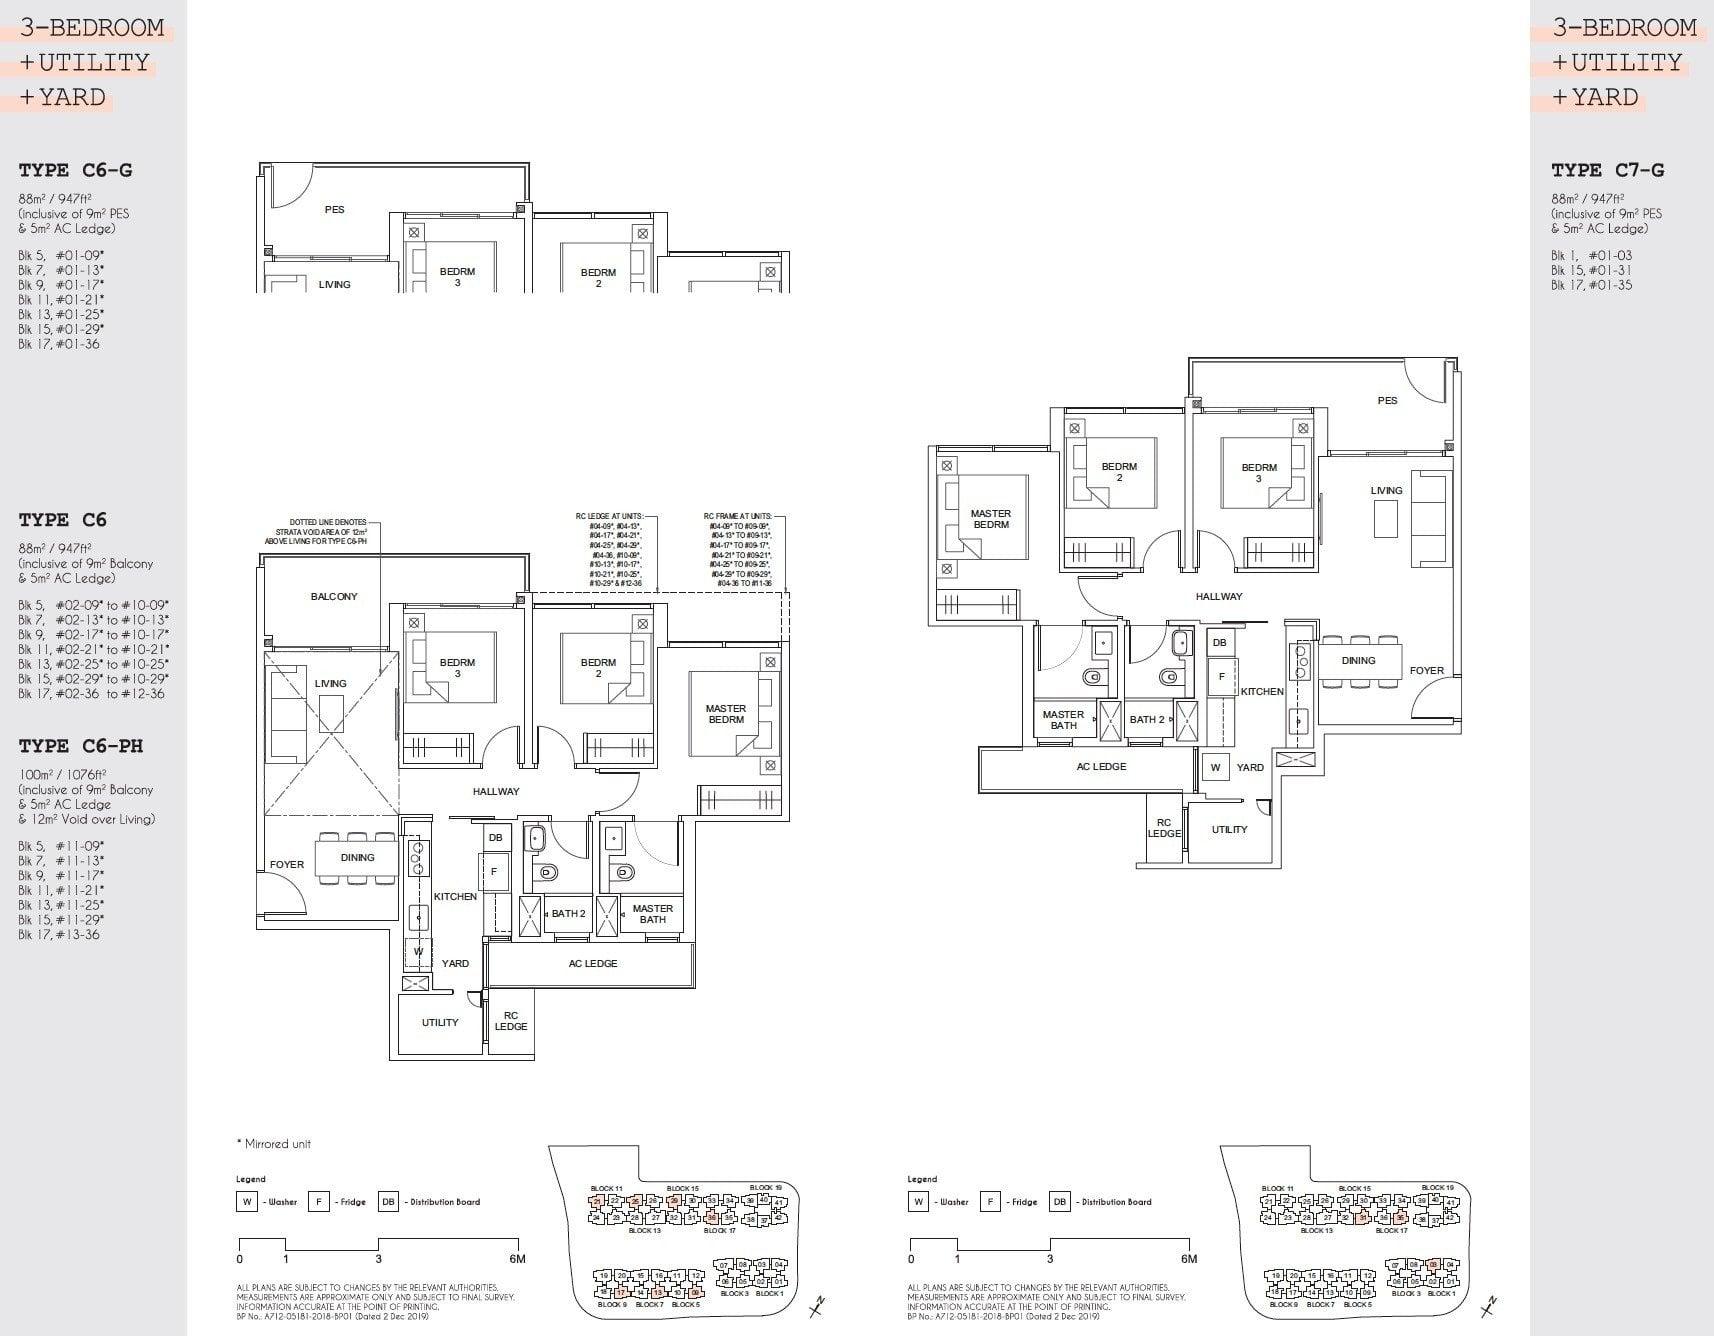 Parc Canberra floor plan floor plan 3BR-4